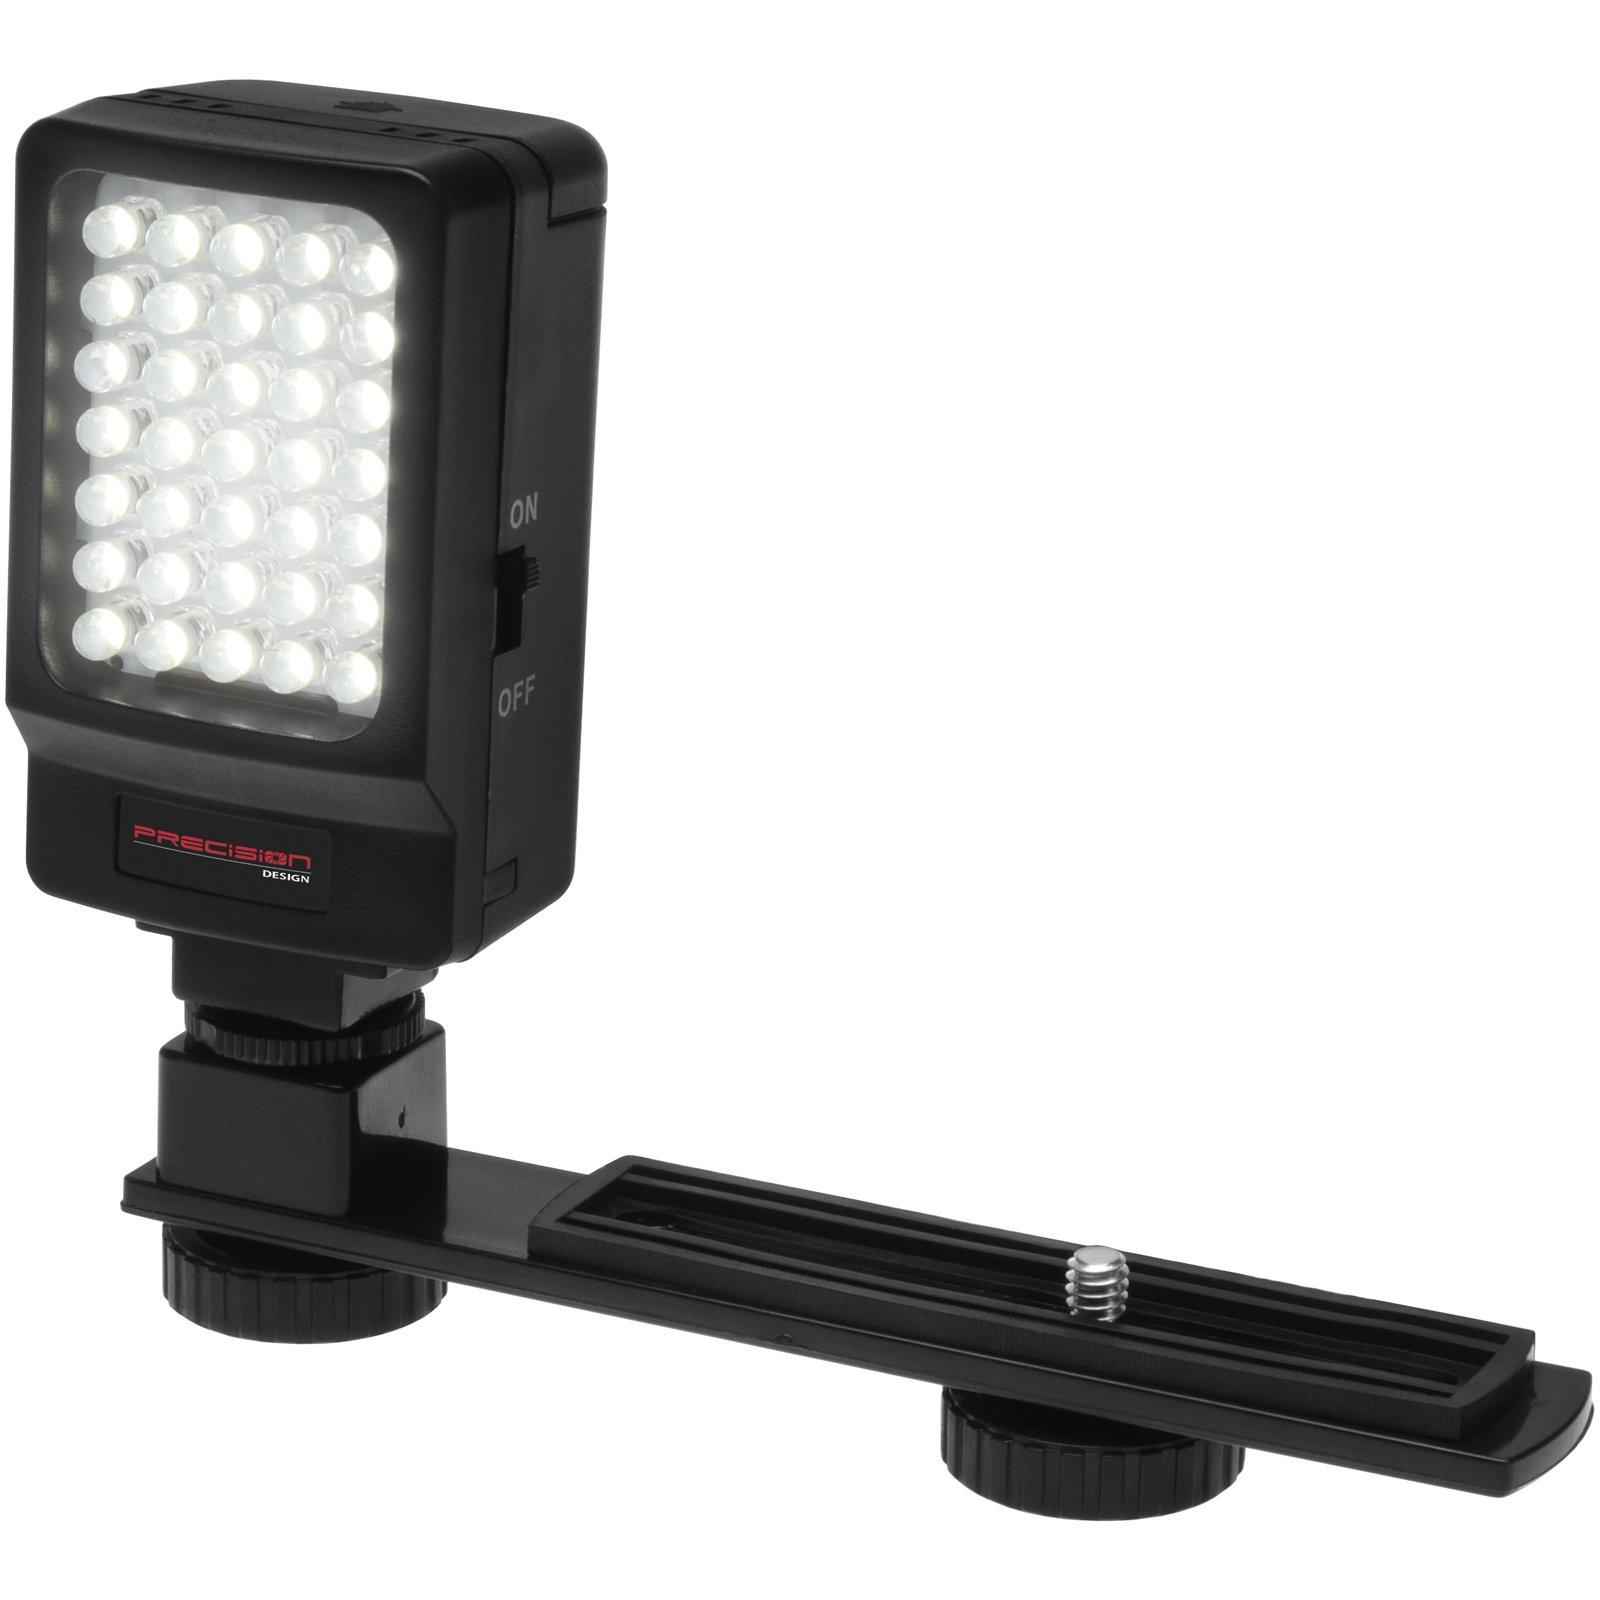 Precision Design Digital Camera / Camcorder LED Video Light with Bracket